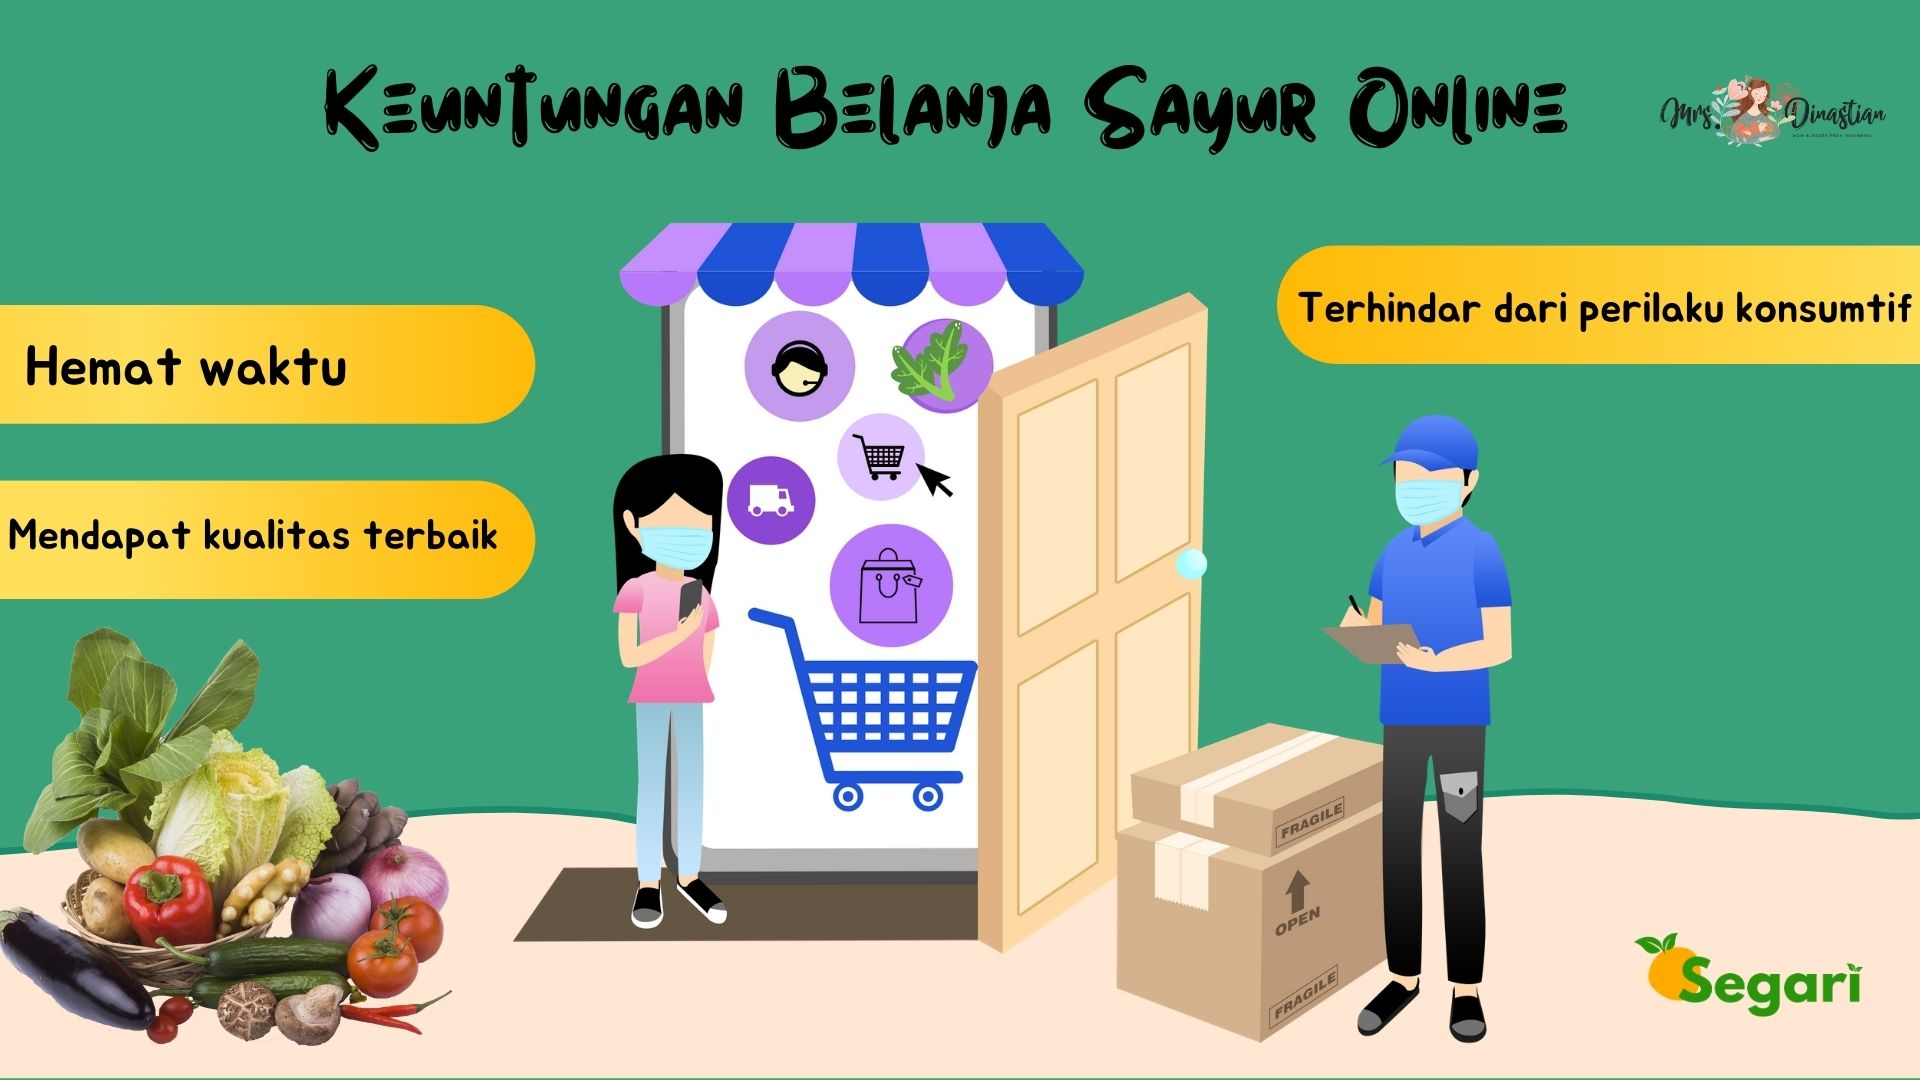 Keuntungan Belanja Sayur Online